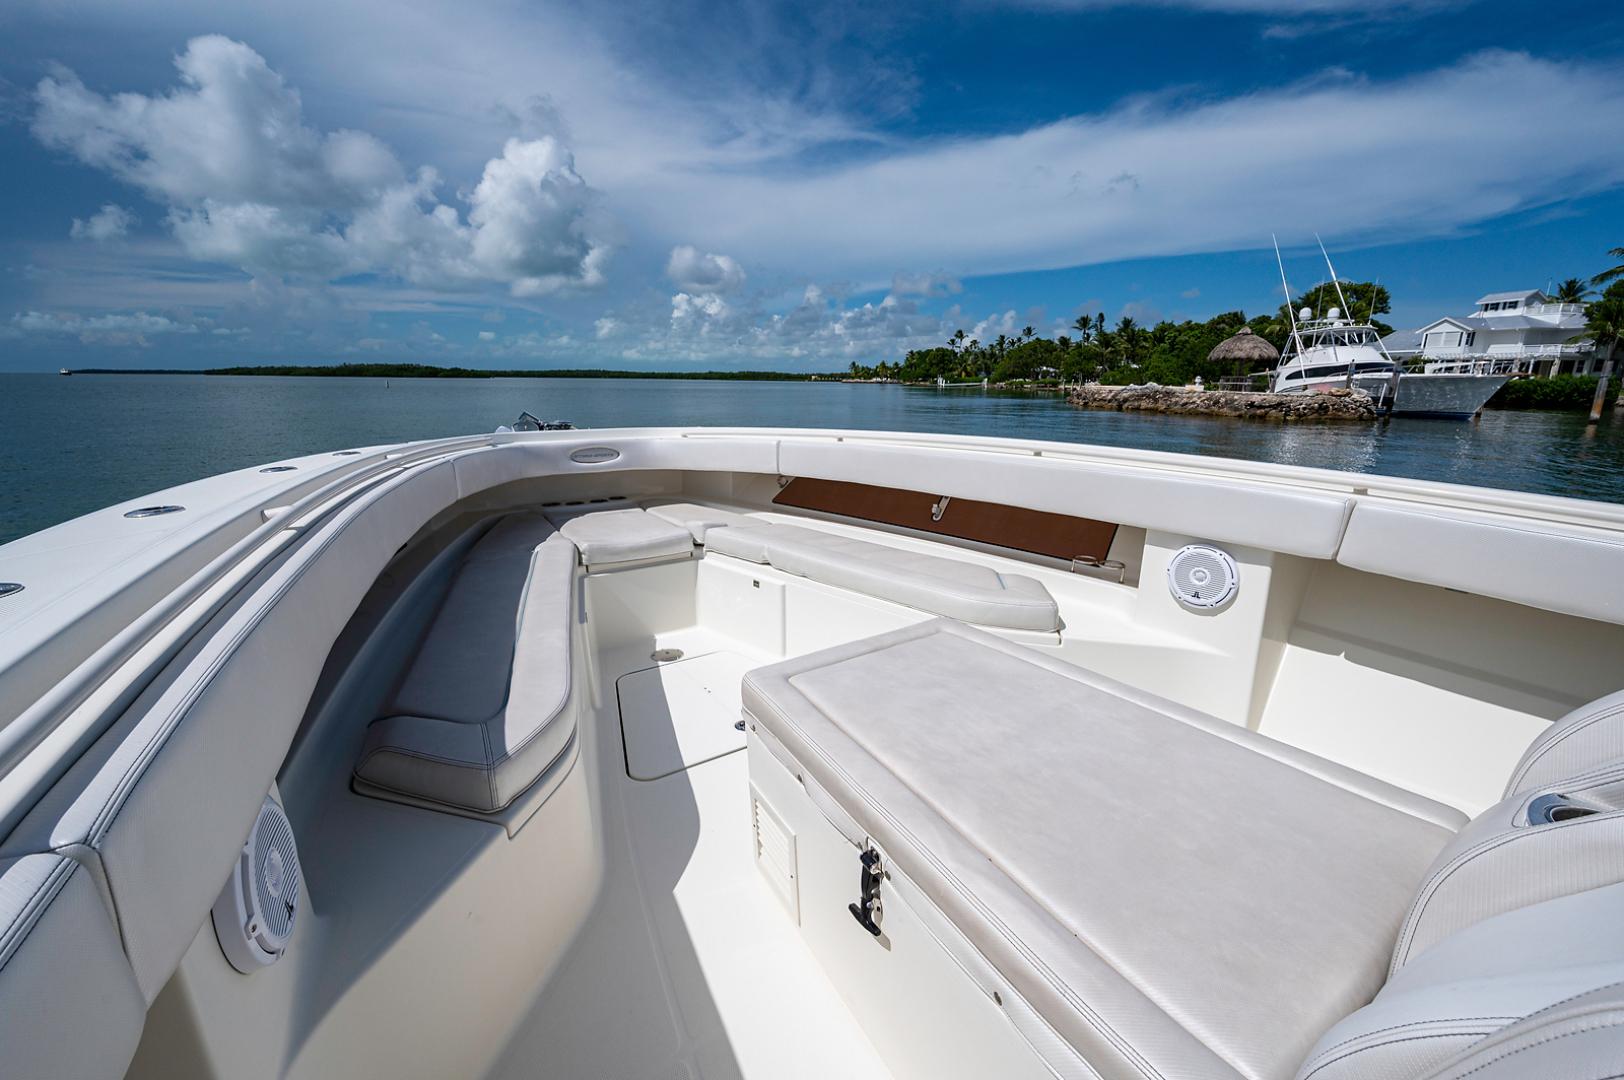 Hydra-Sports-4200 SF 2014-S3XY Key Largo-Florida-United States-1541150   Thumbnail